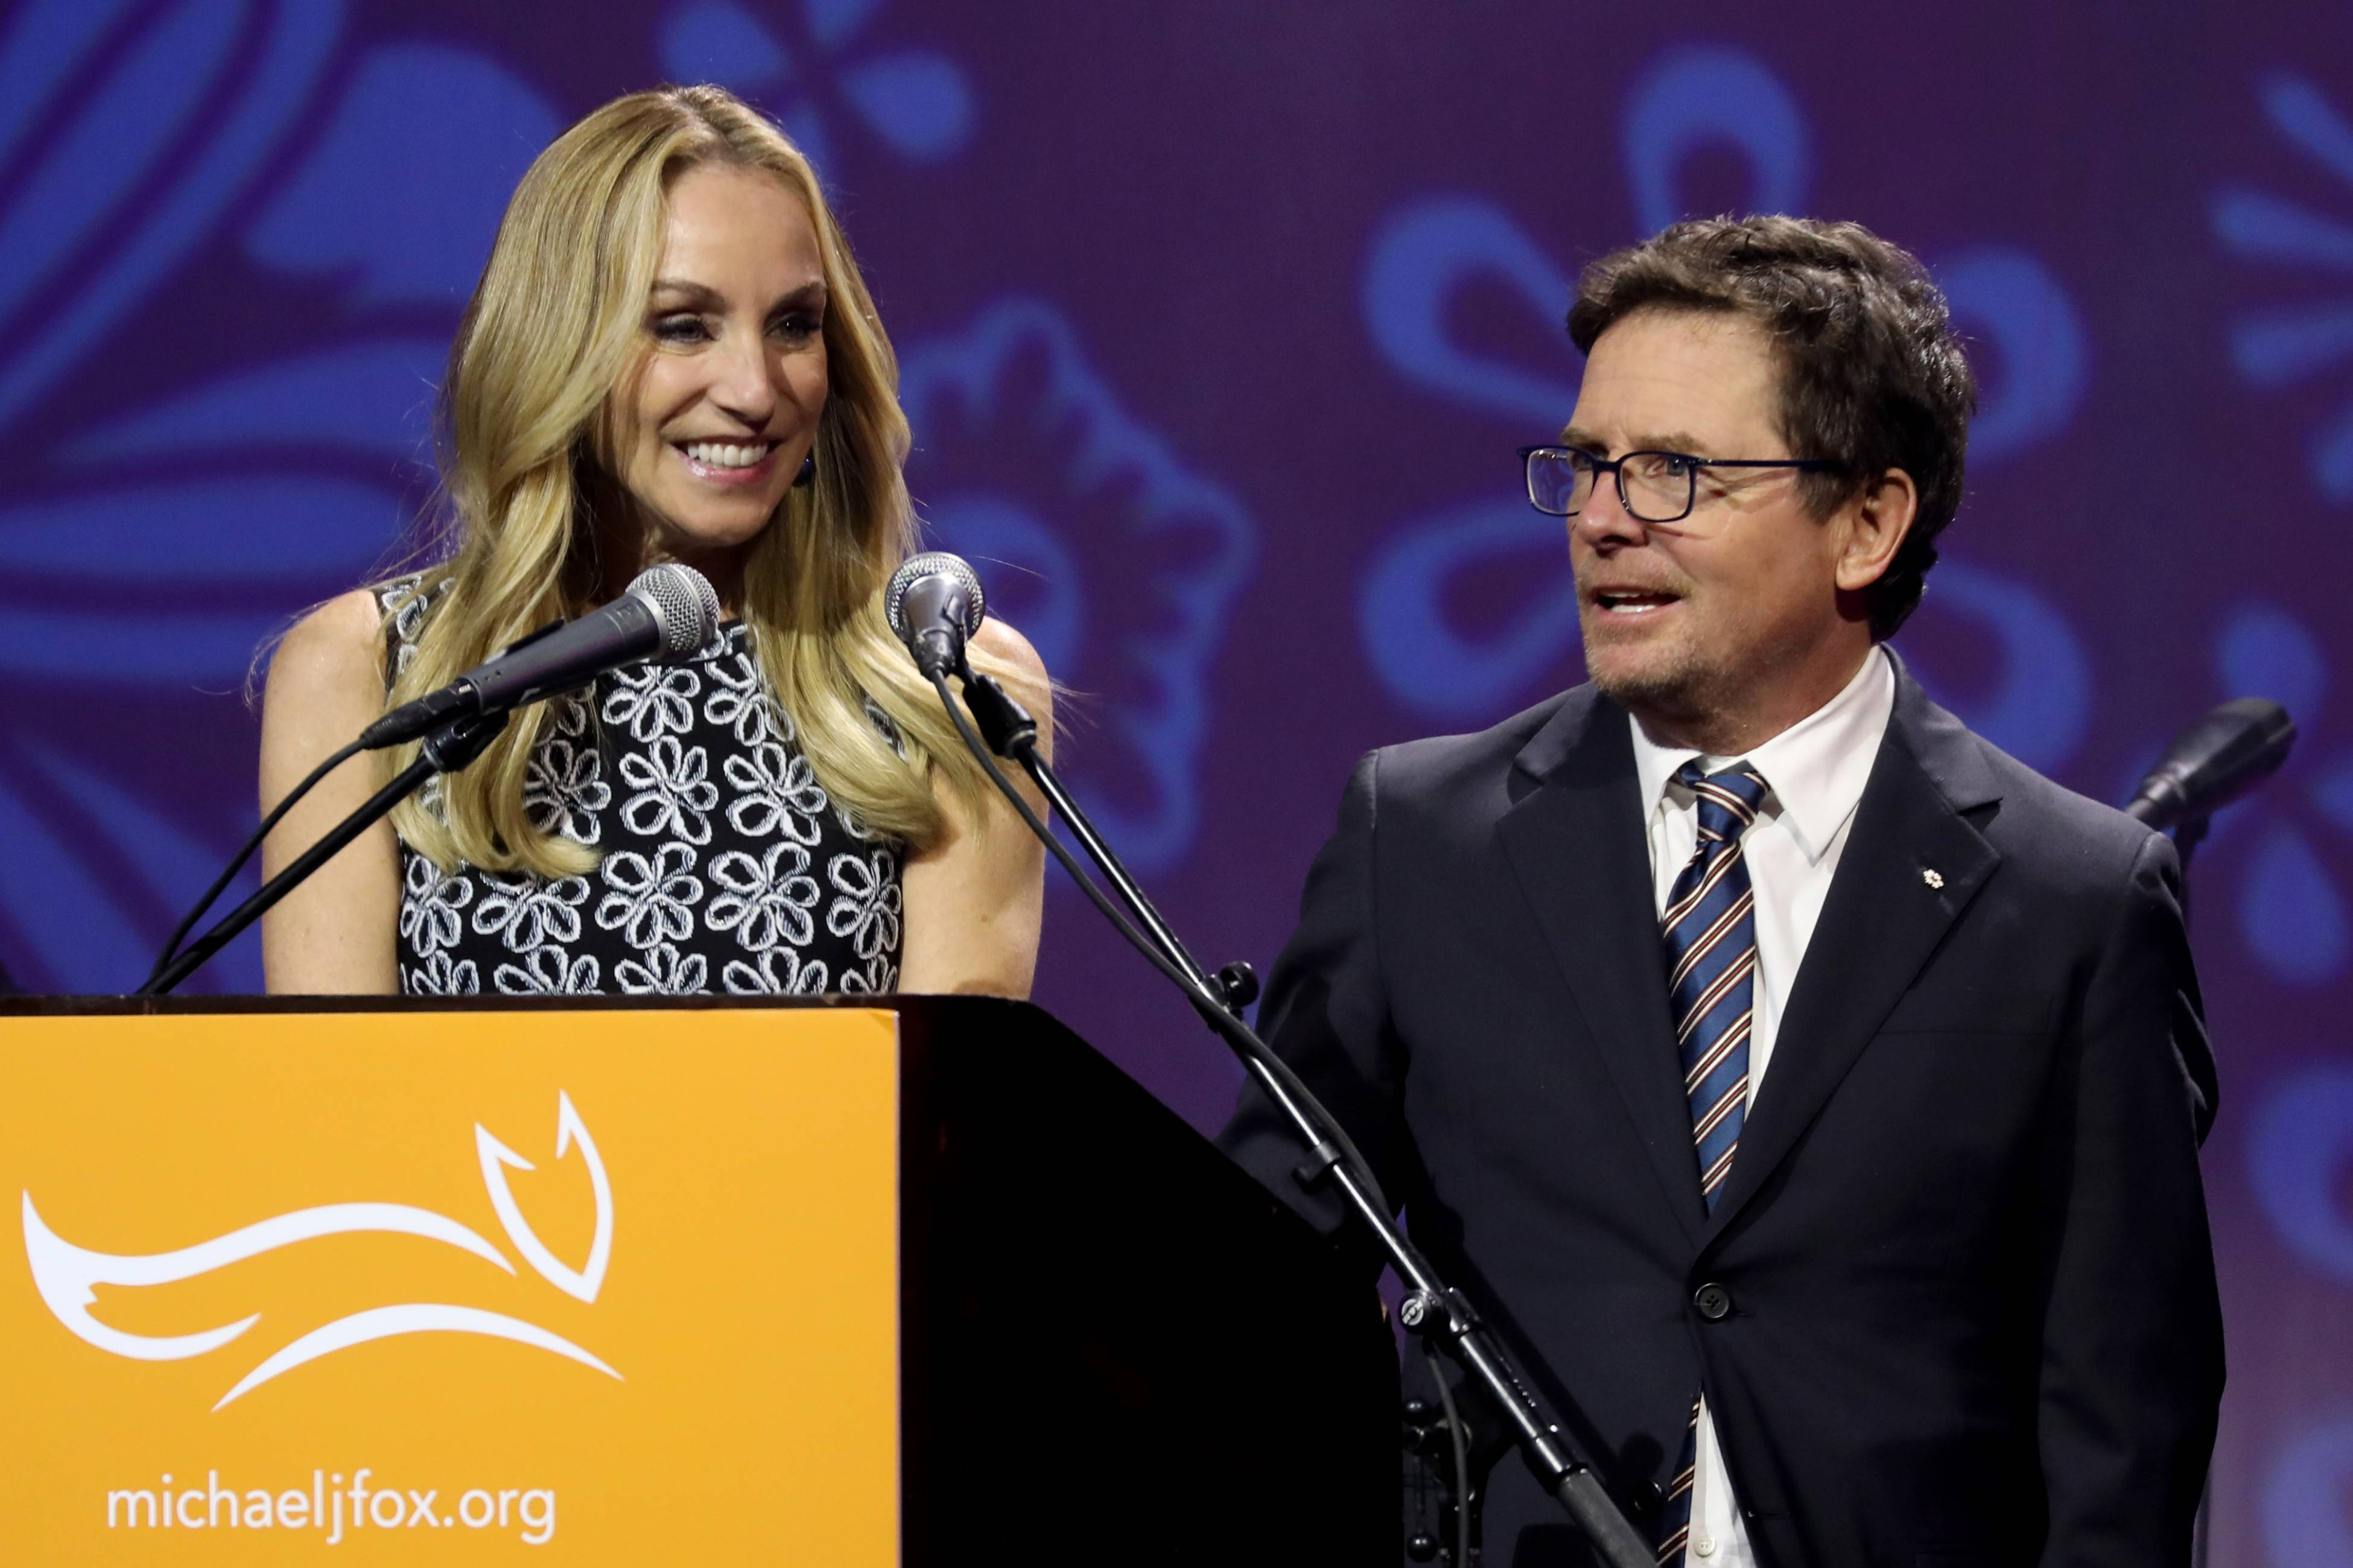 Michael J Fox 23andMe Parkinsons